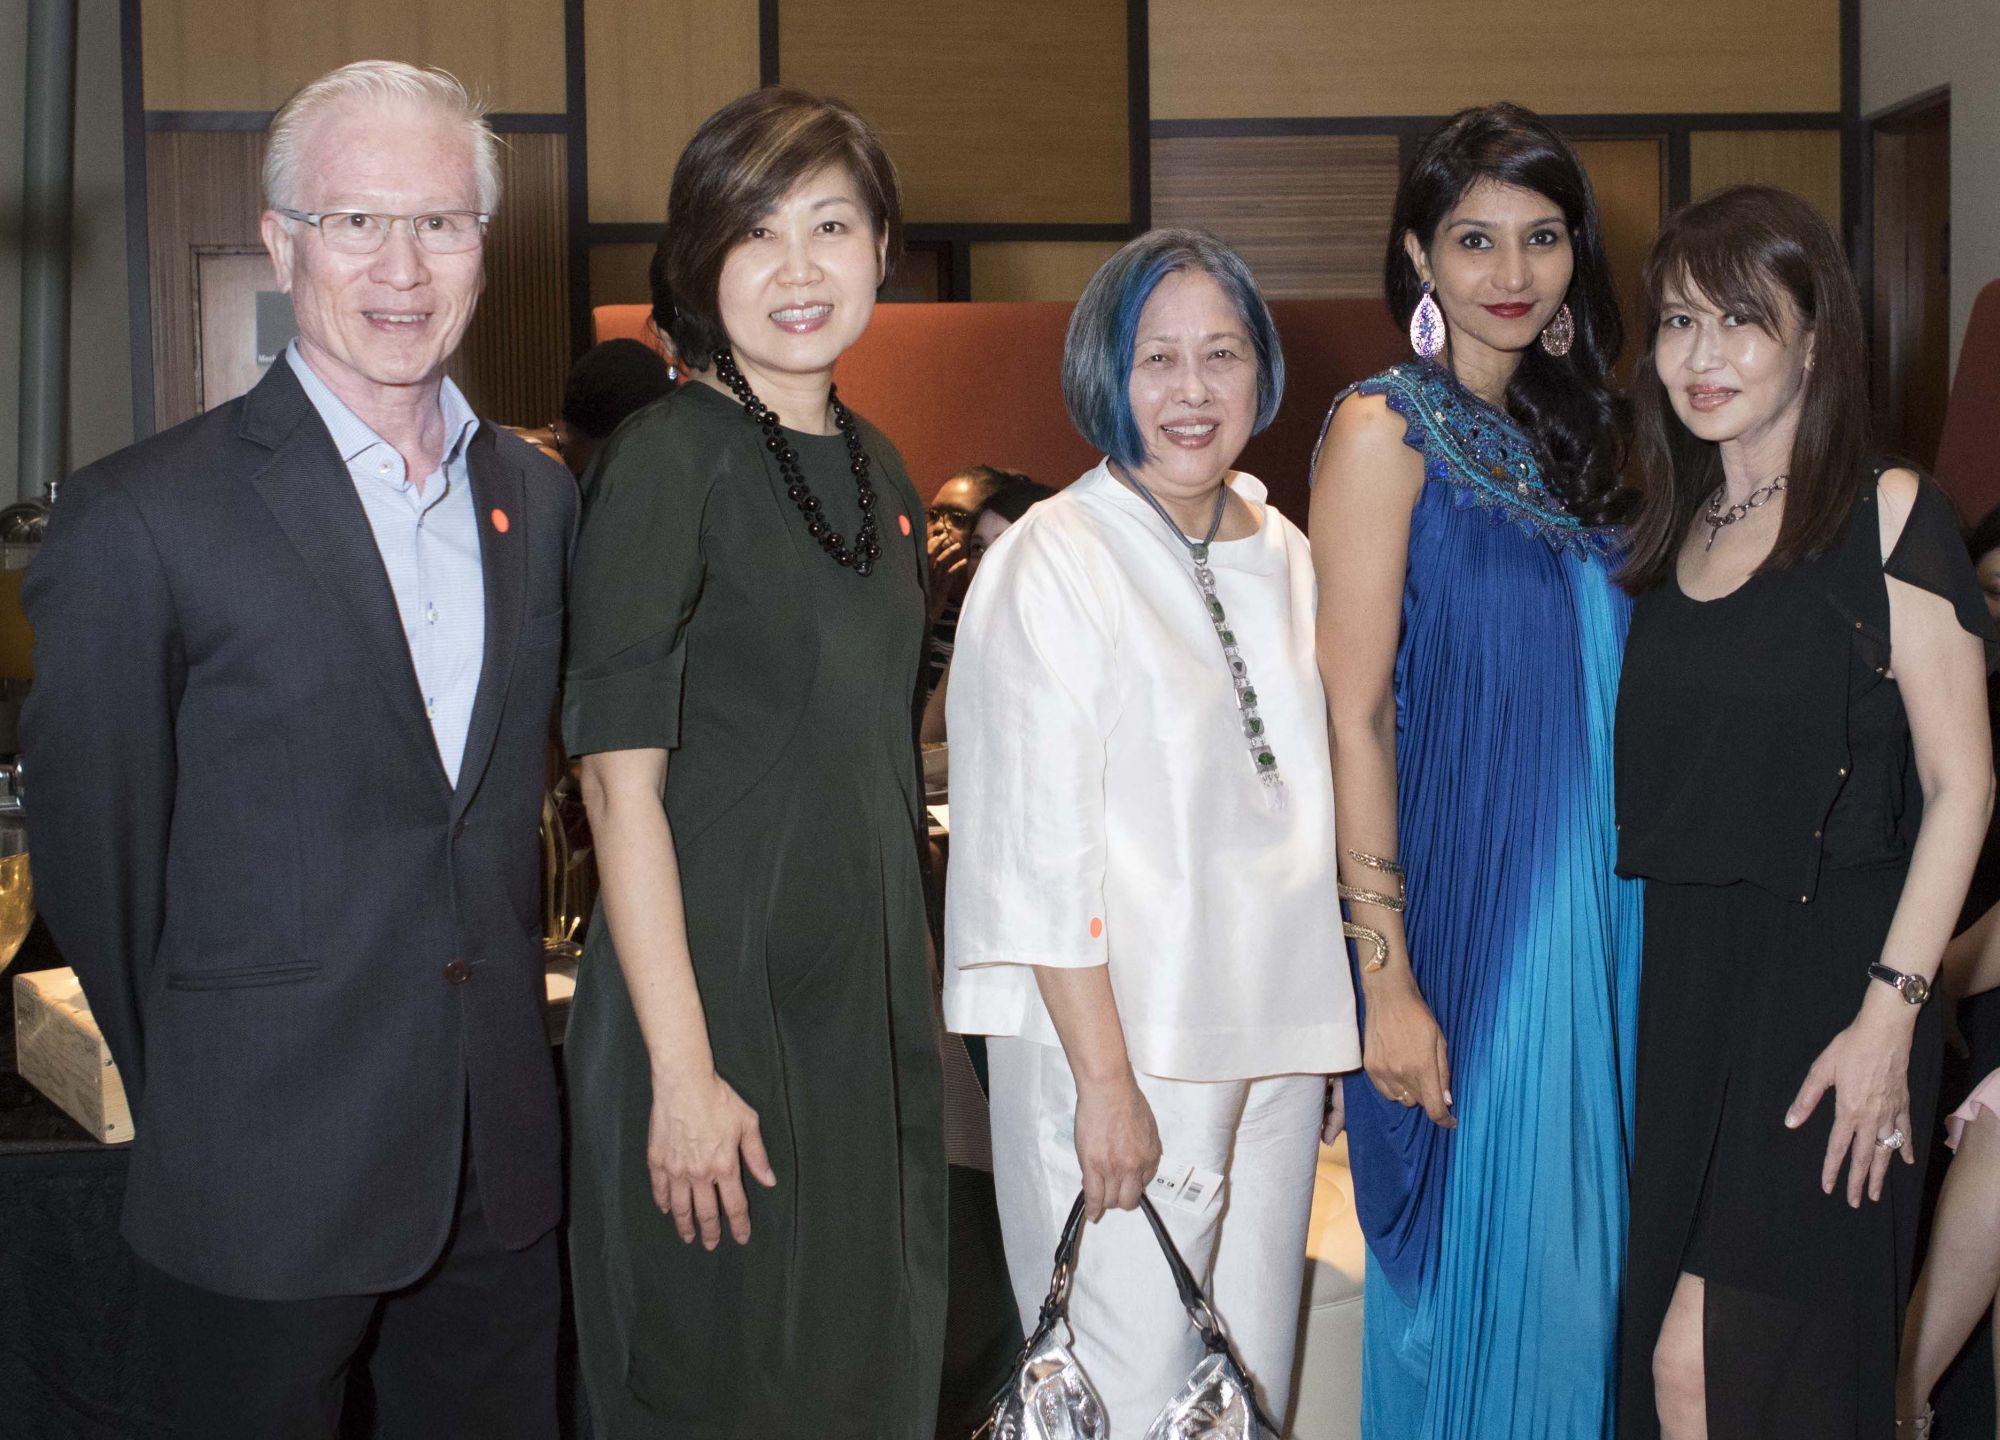 Arthur Fong, Hani Fong, Ling Ai Ee, Manju Chandran, Evelyn Sam